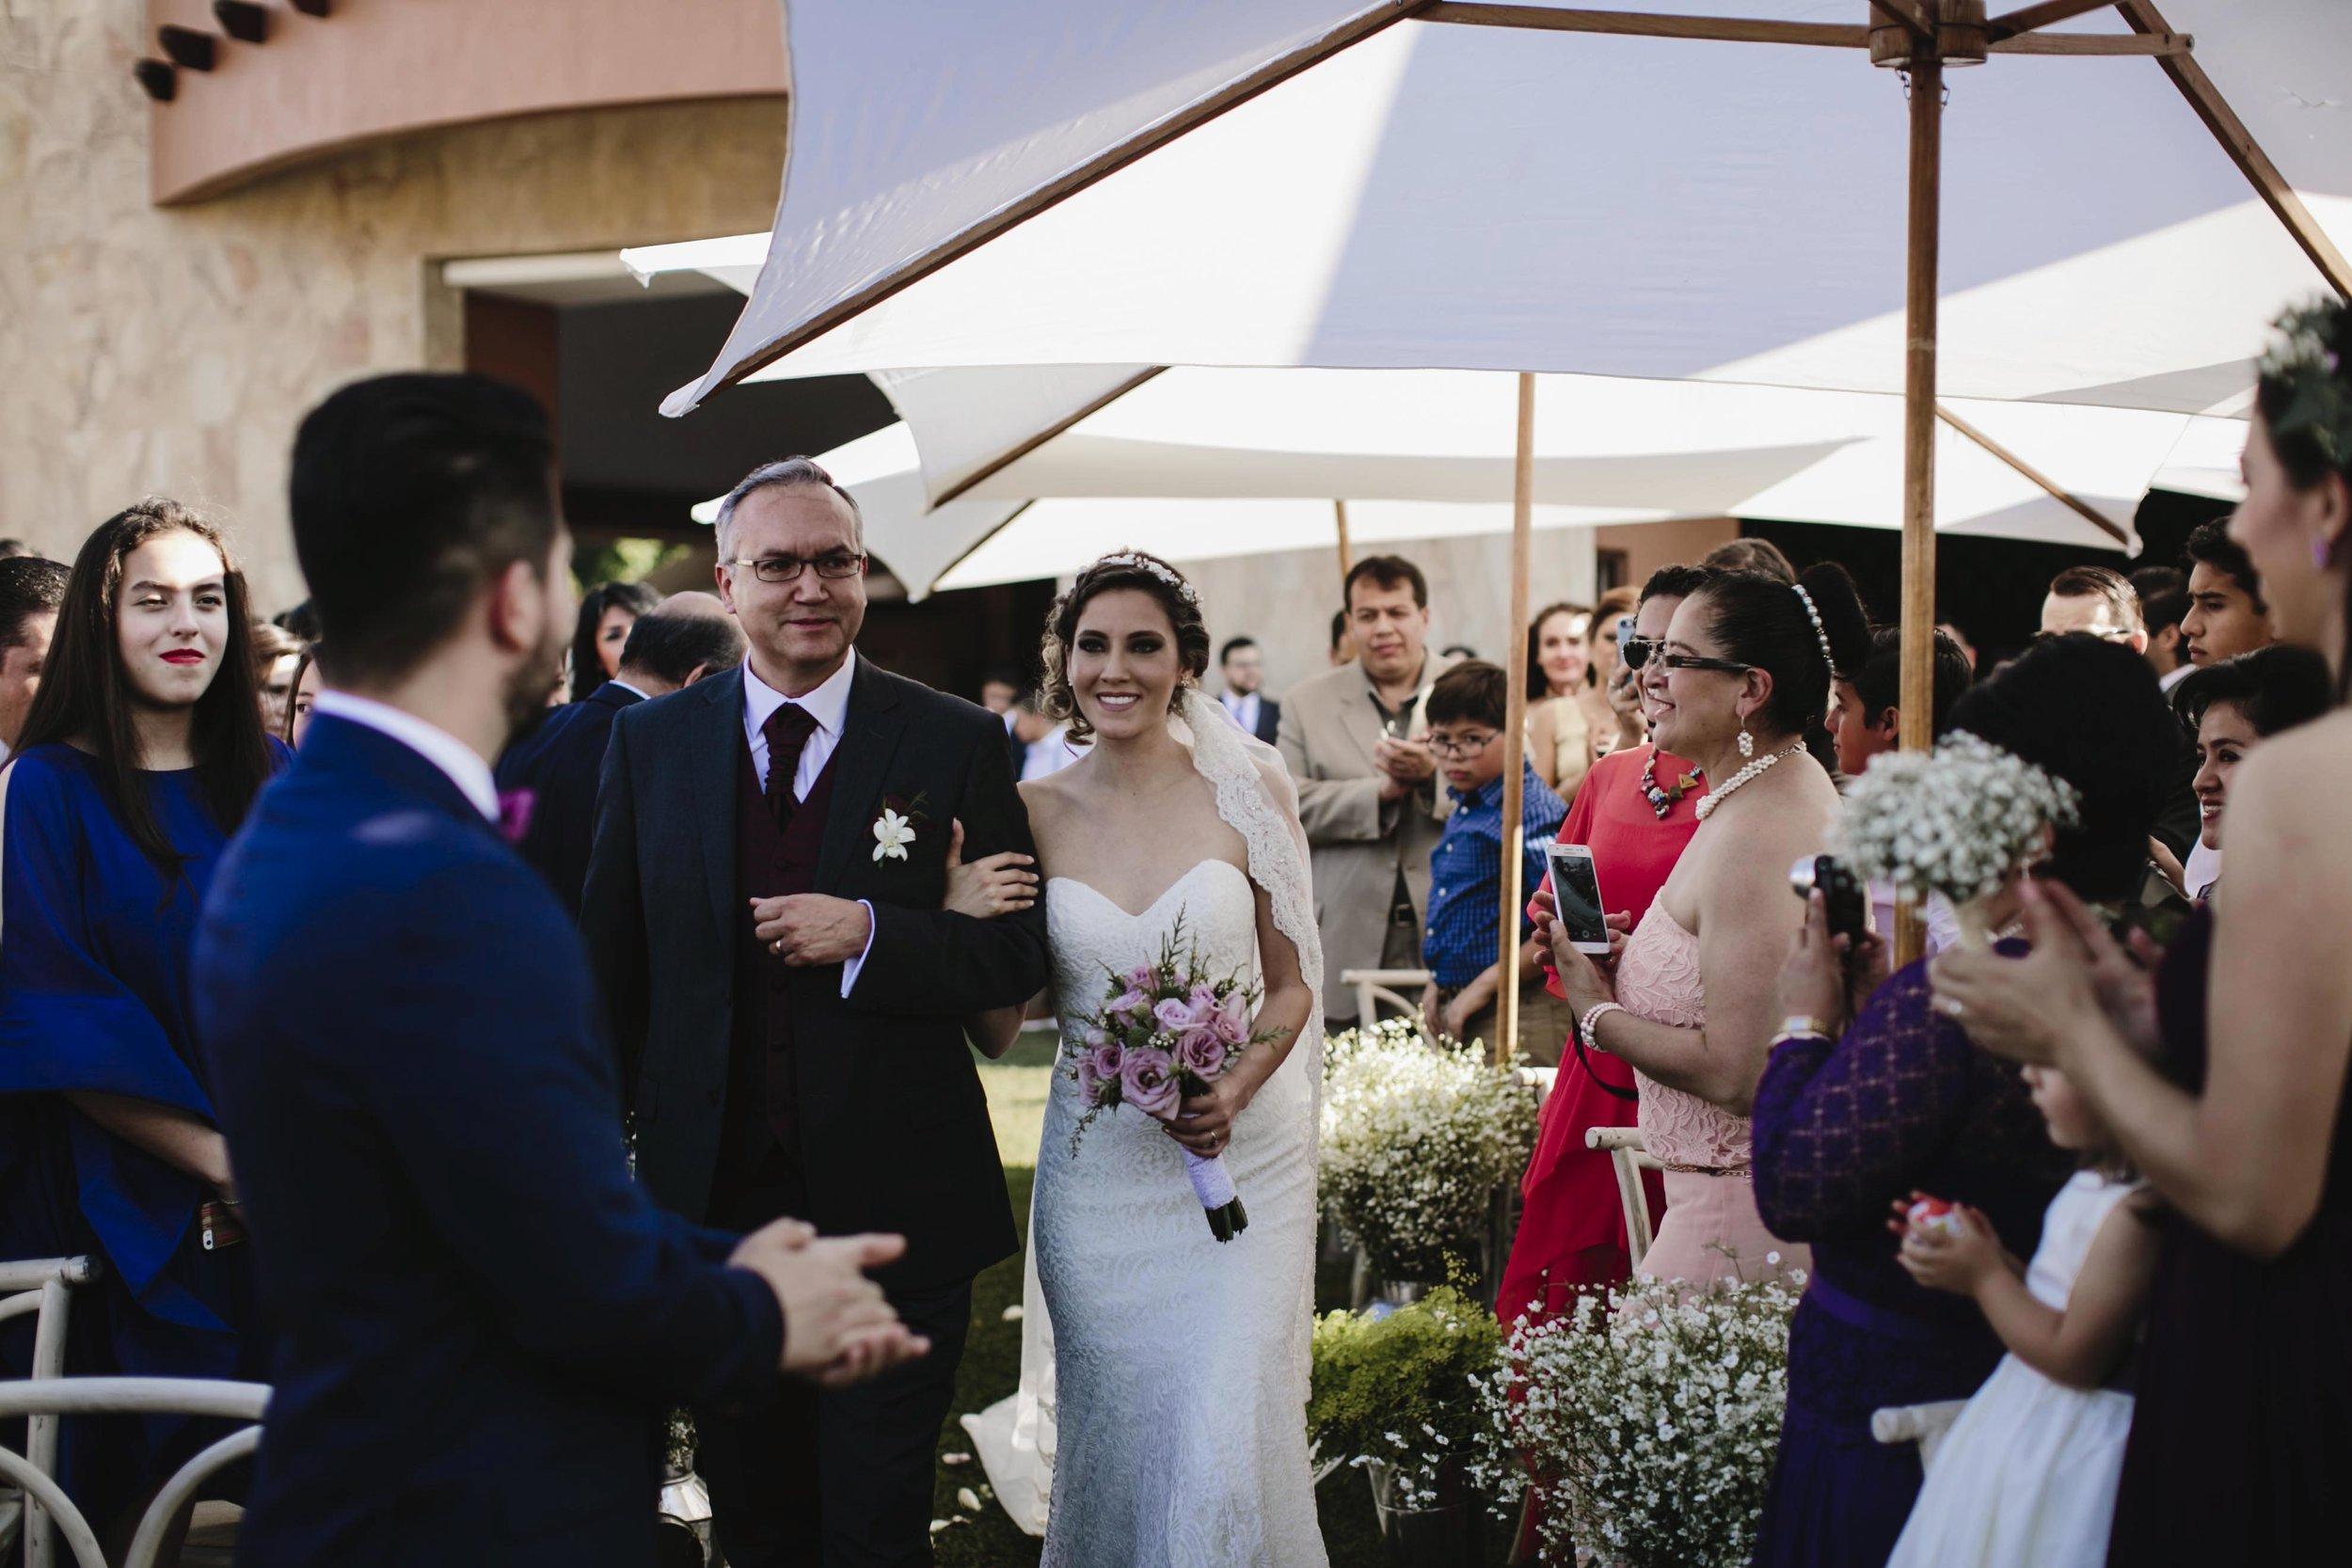 alfonso_flores_destination_wedding_photography_jardin_amarello_cuernavaca76.jpg